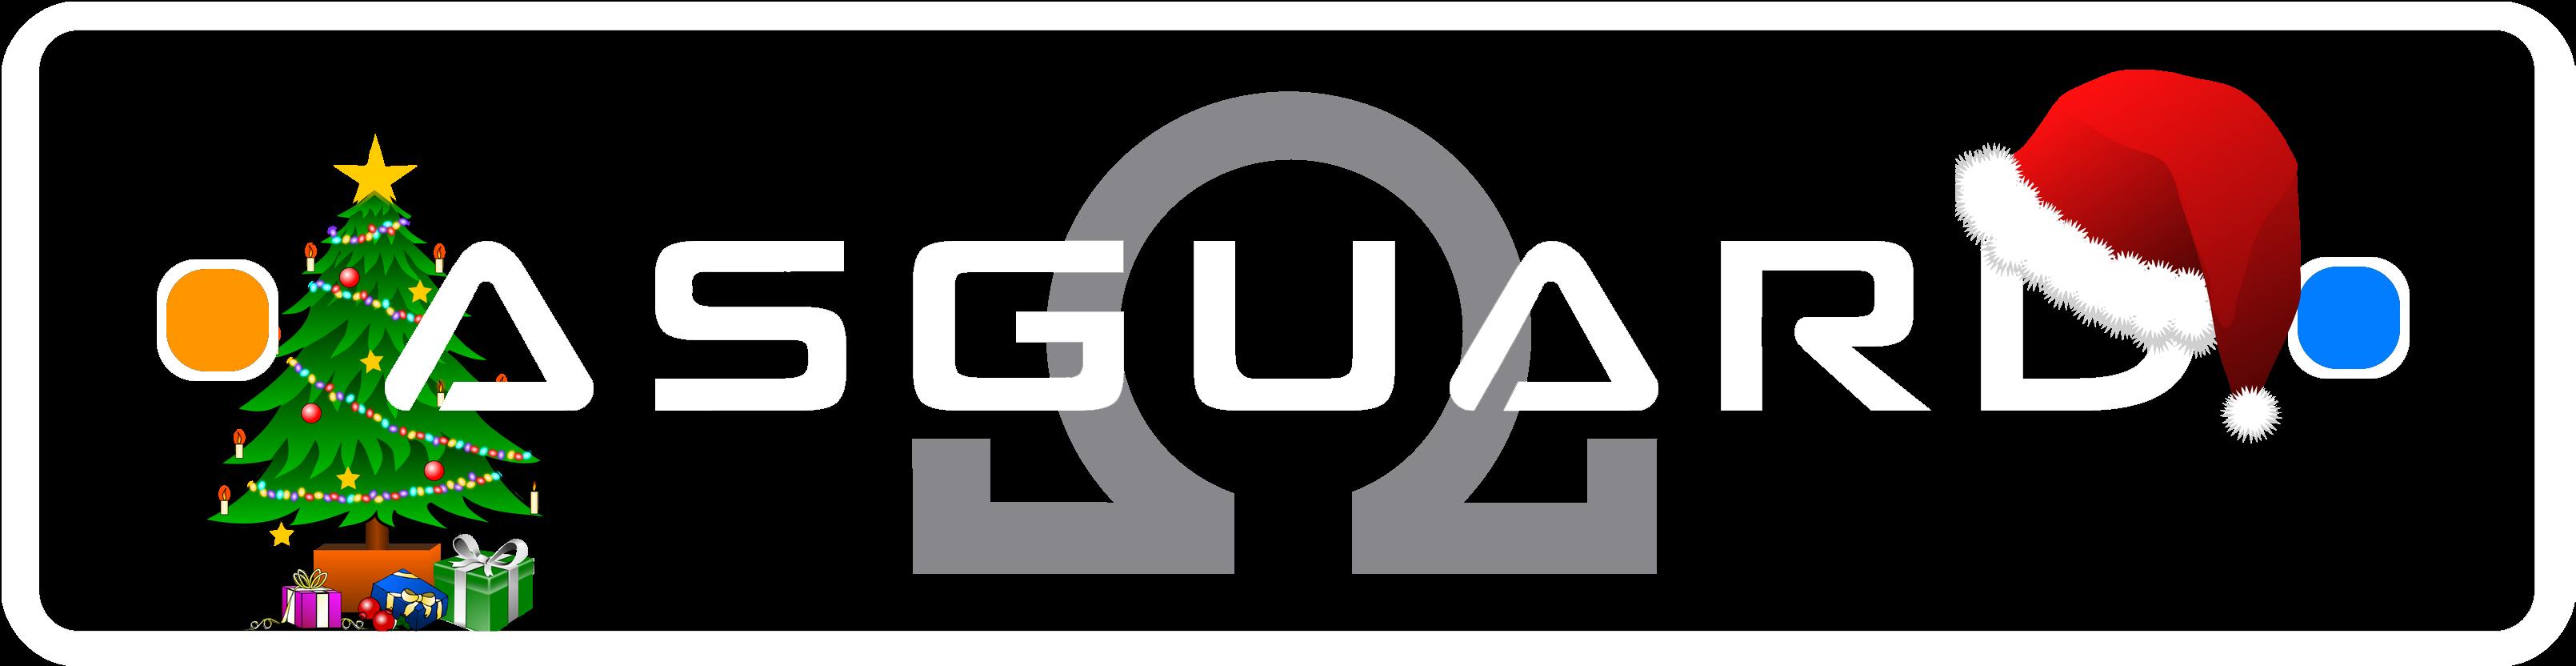 Logo Asguard Noël